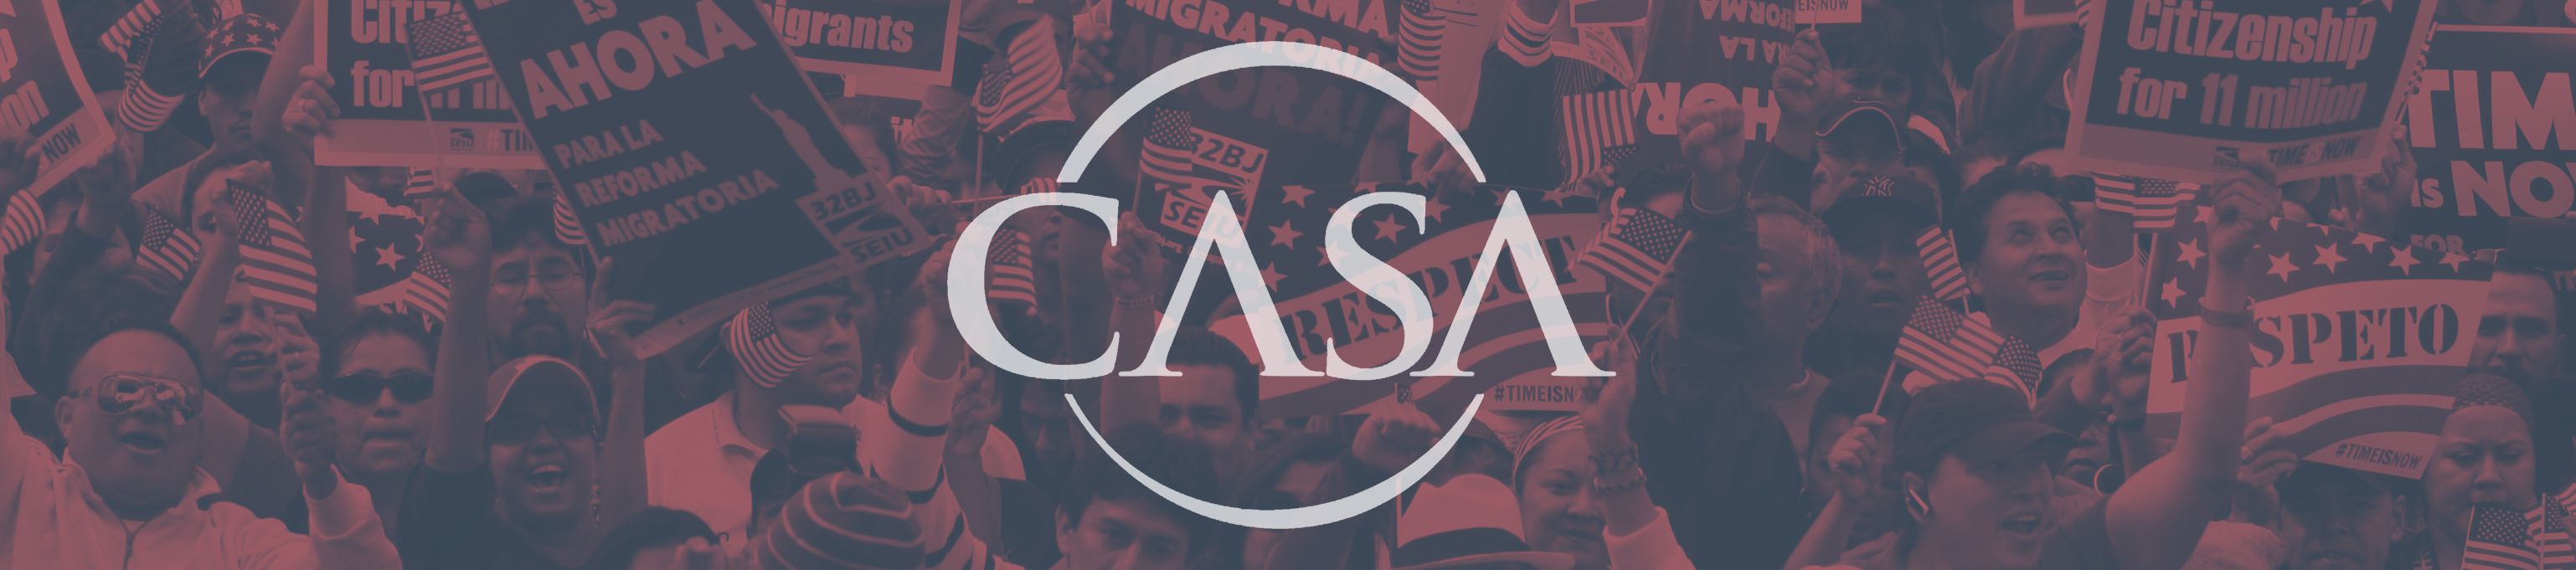 Visit CASA's website